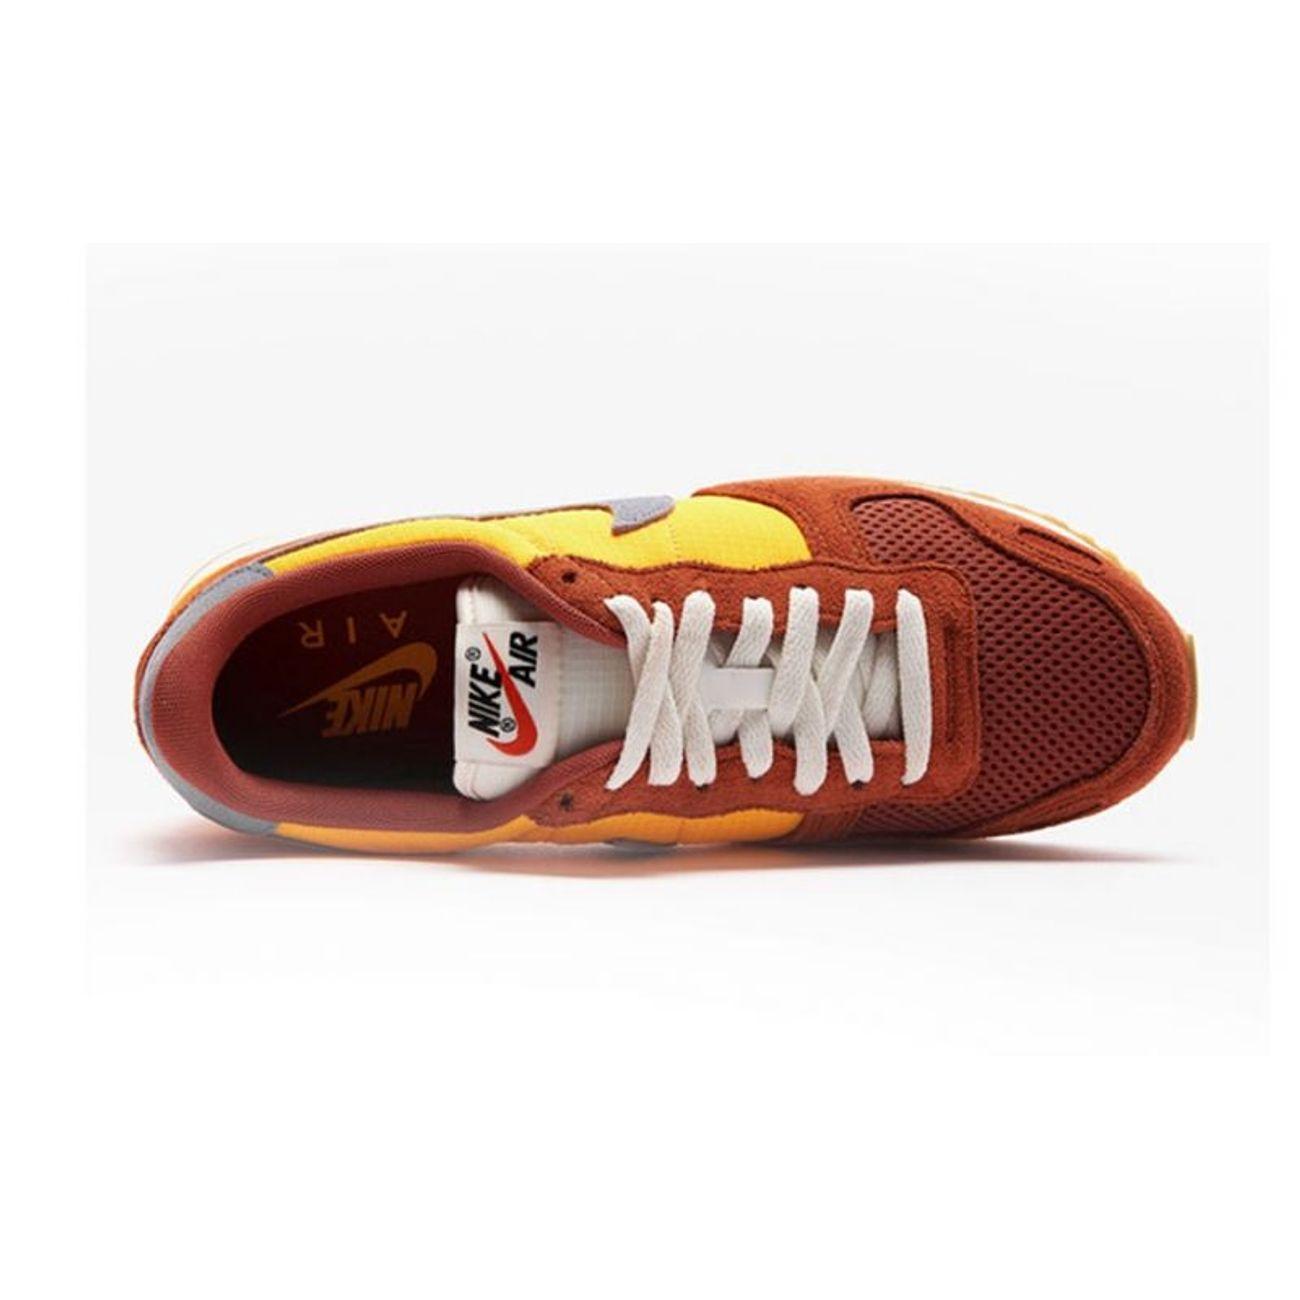 Padel Nike 201 Air Pêche Adulte Obscure Vrtx Ni903896 WHIE9YD2